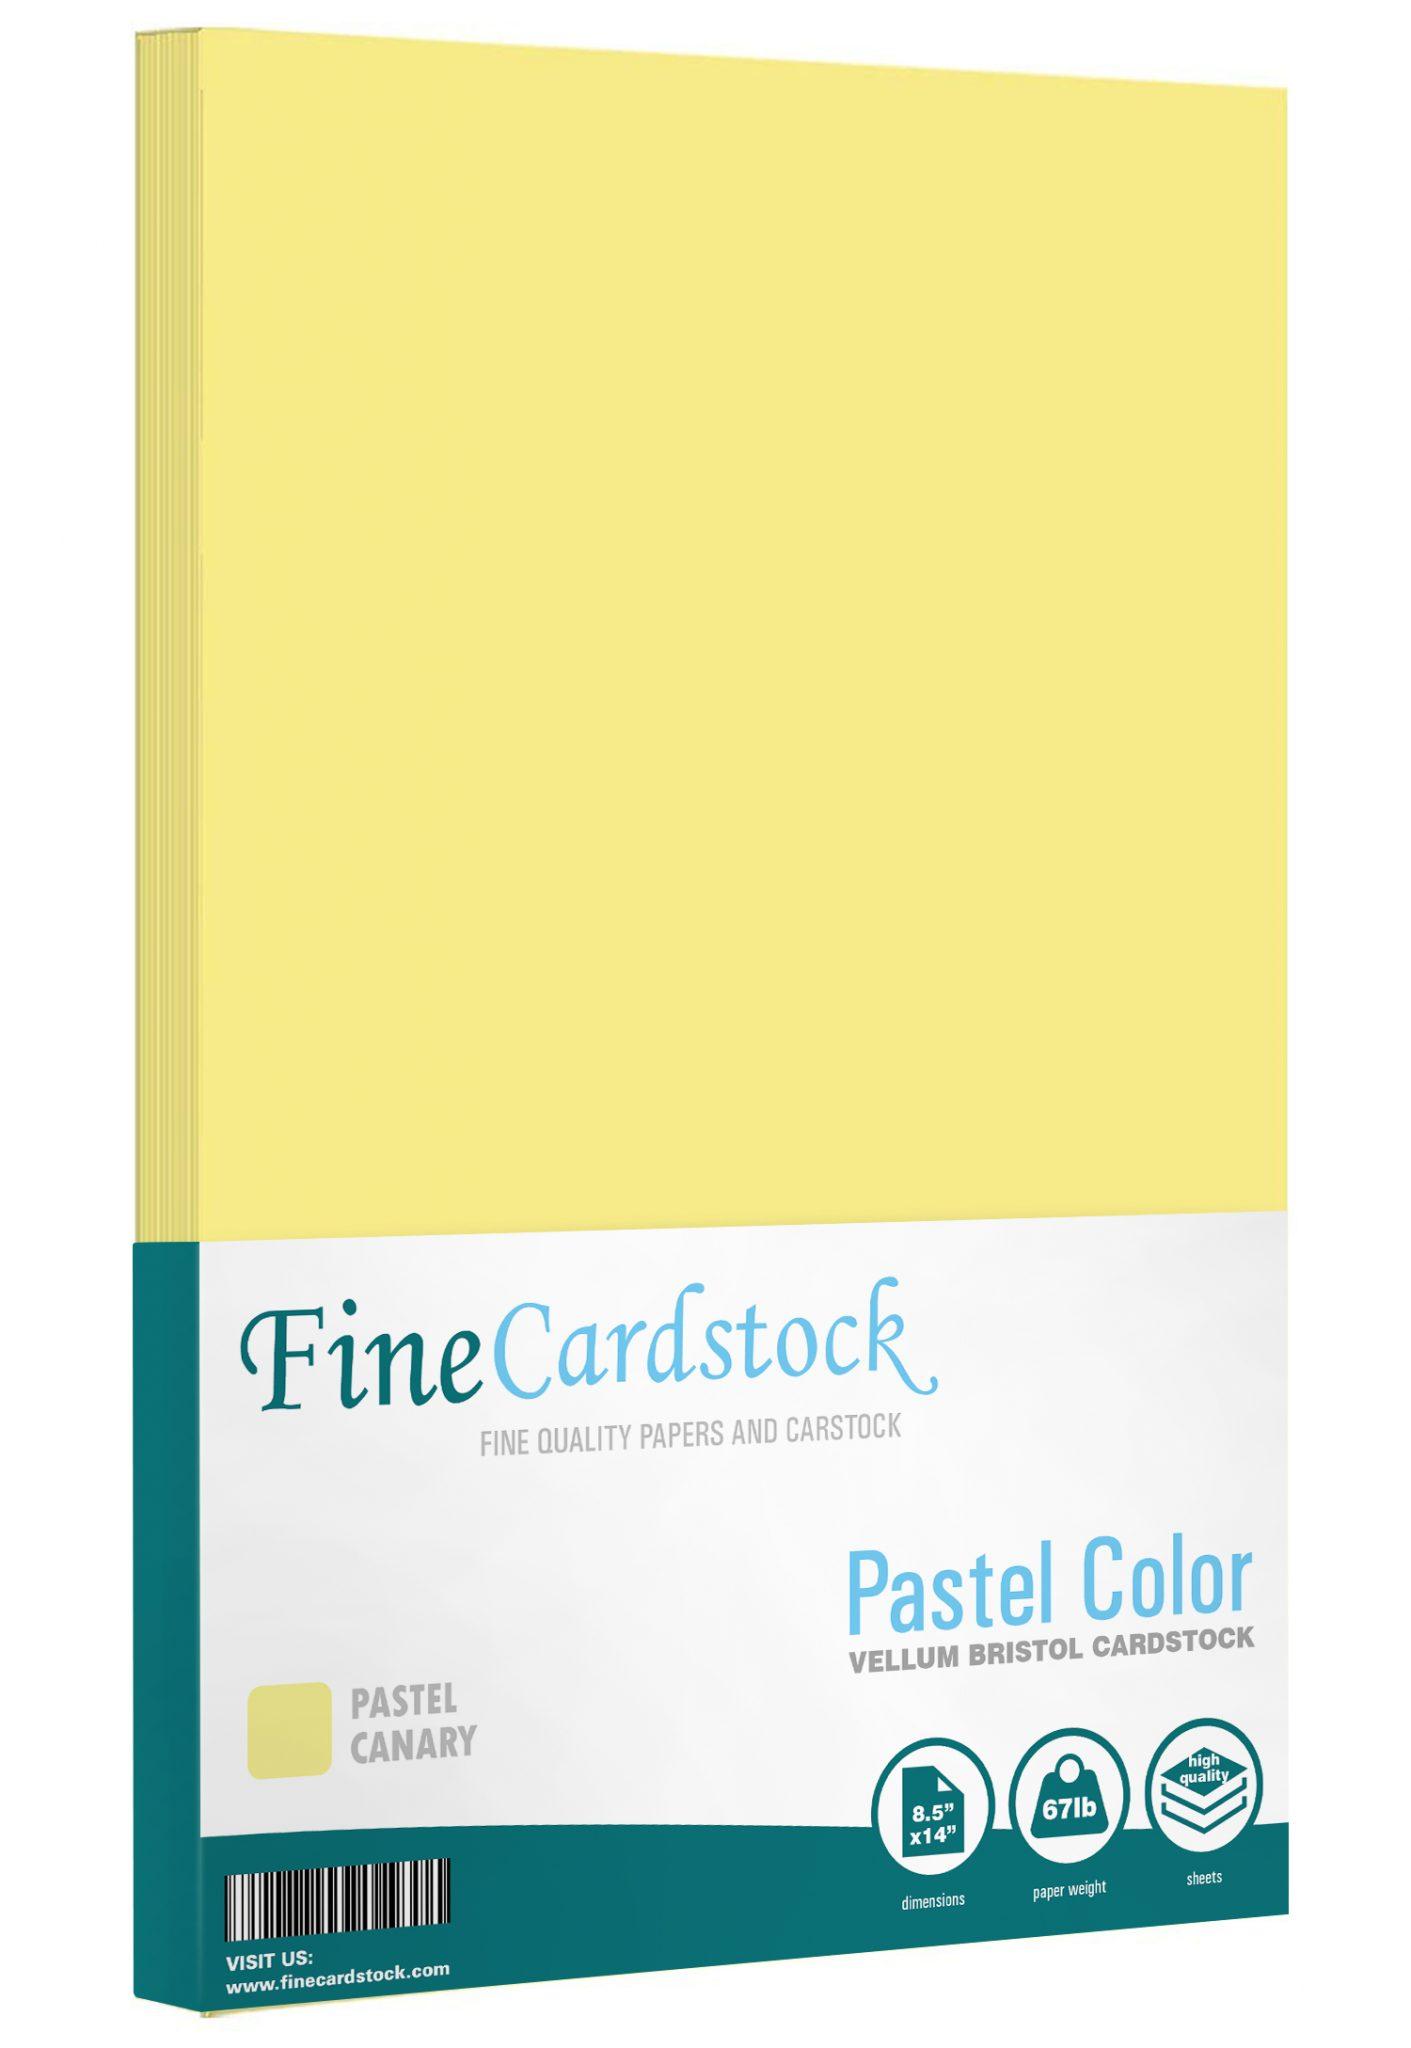 8.5 x 14 Pastel Cardstock